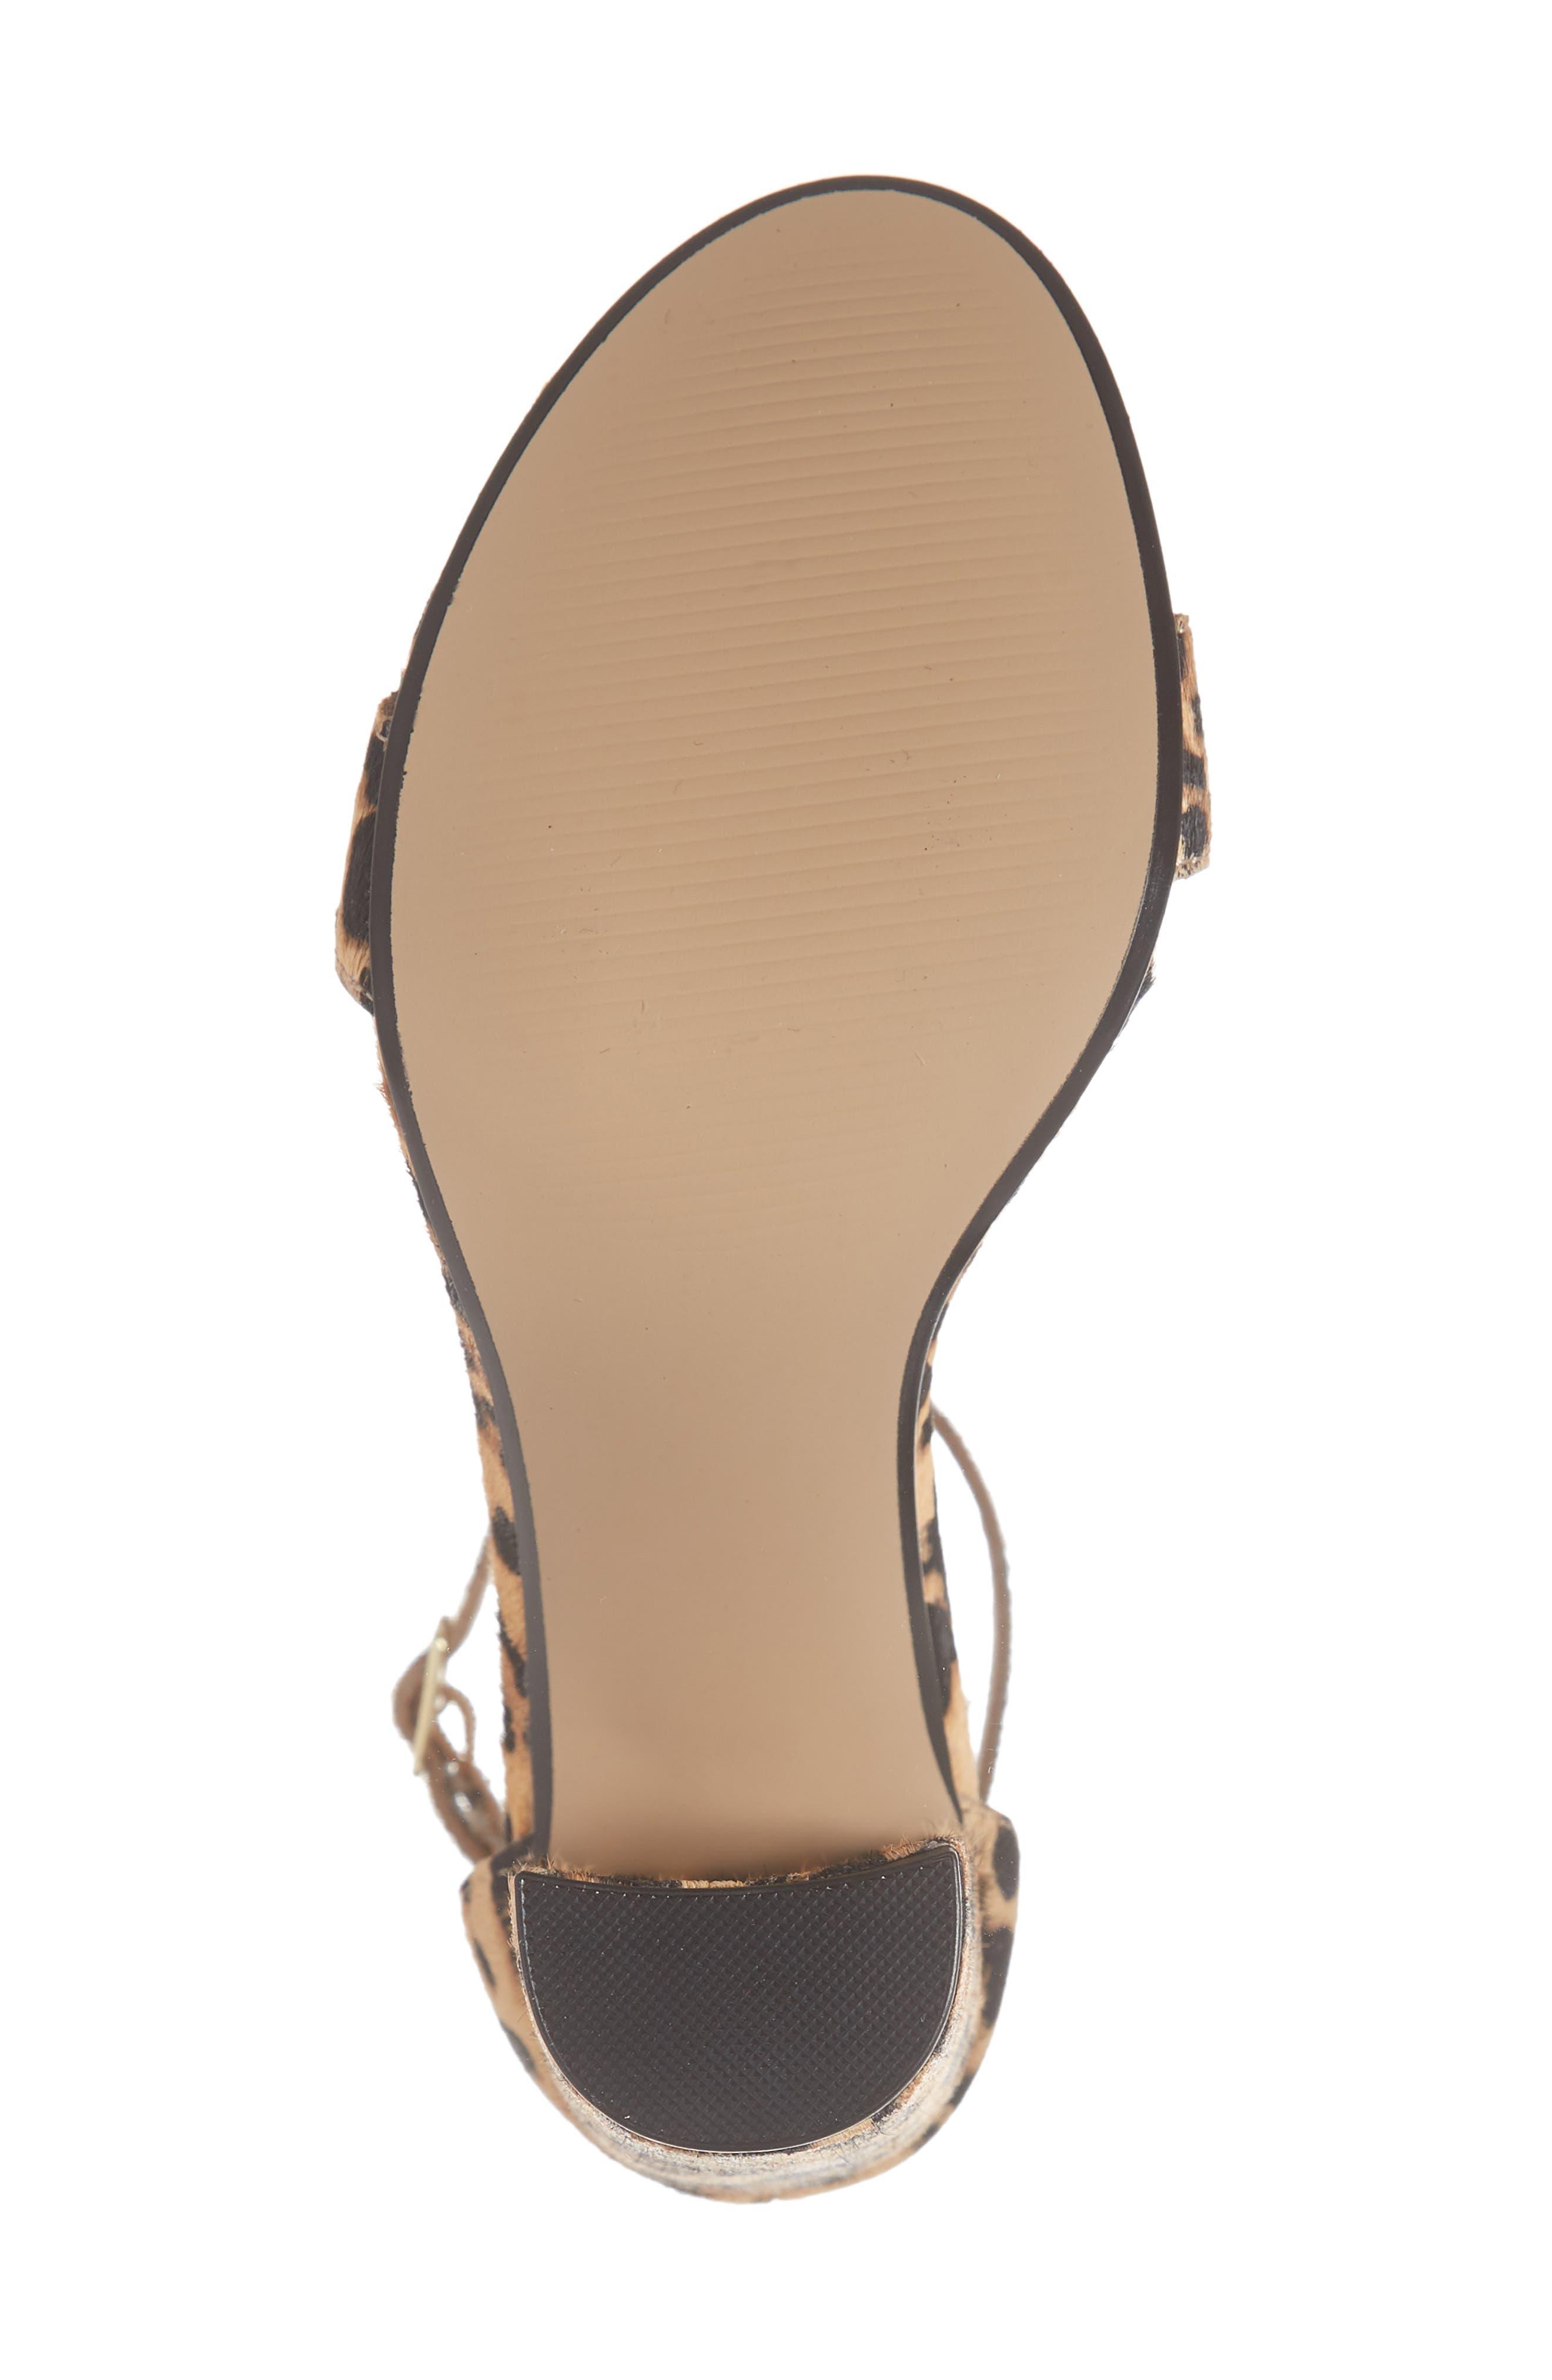 'Carrson' Sandal,                             Alternate thumbnail 6, color,                             LEOPARD MULTI